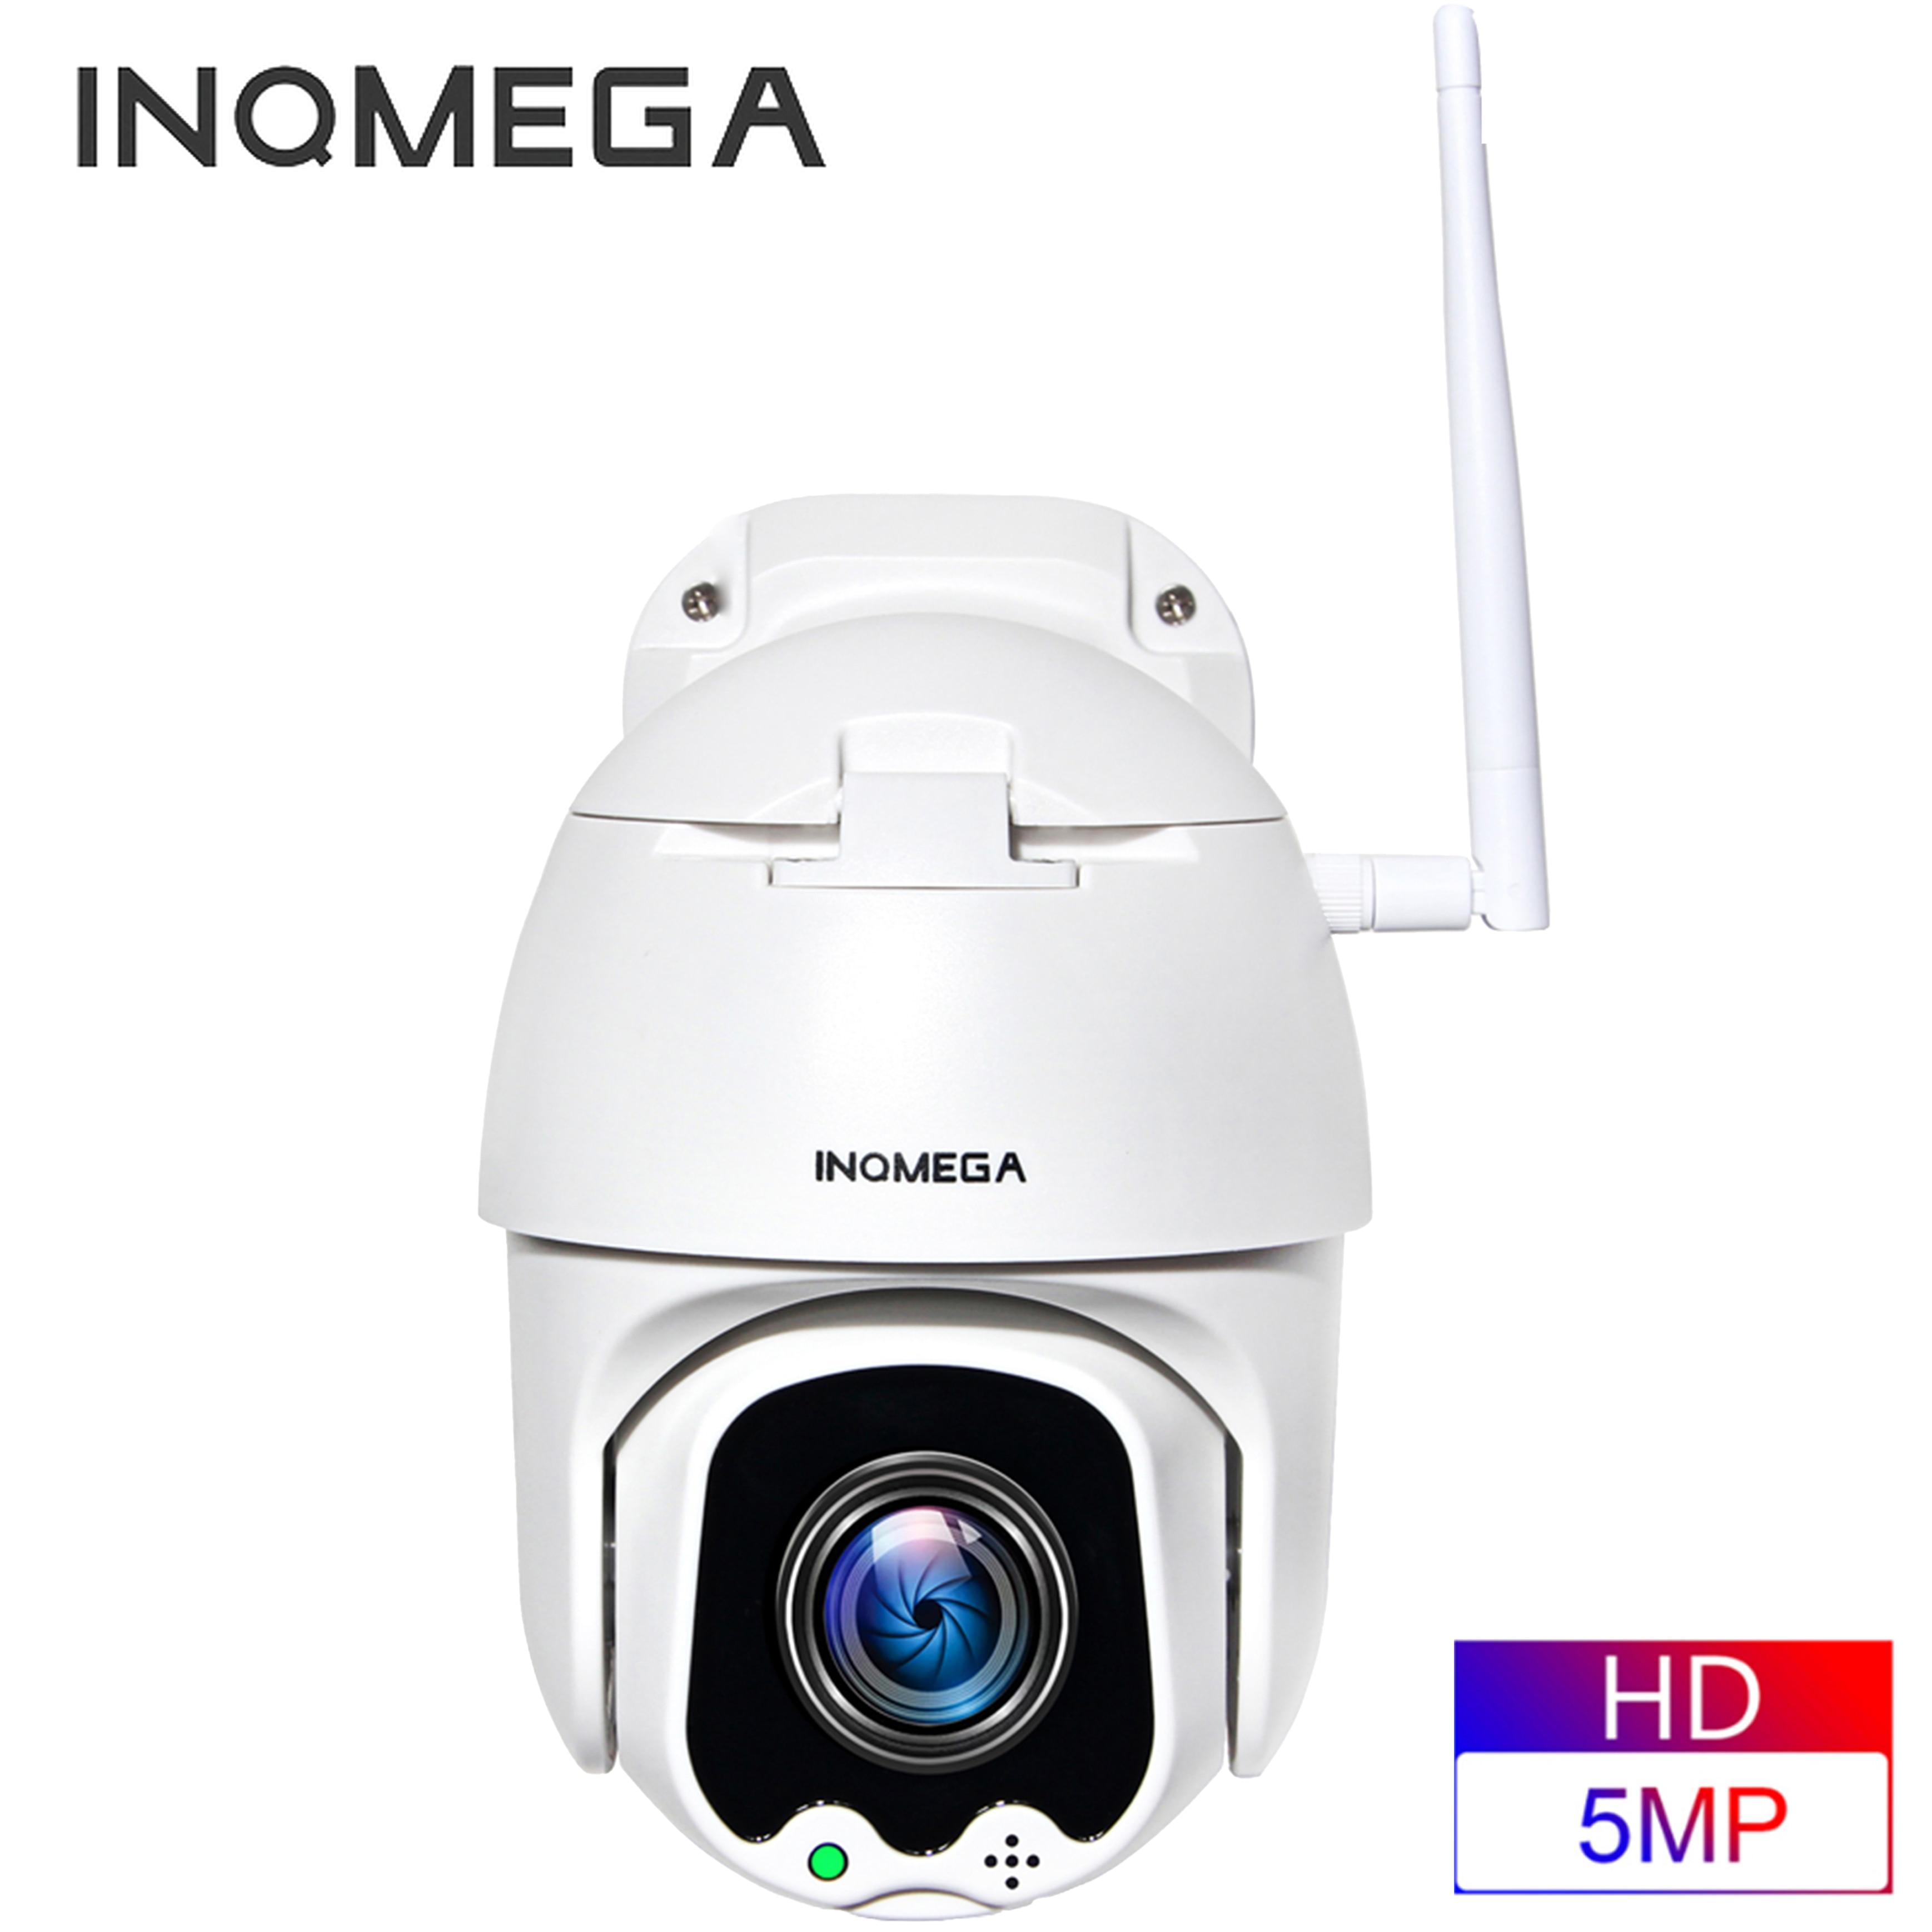 INQMEGA 5MP FHD PTZ Smart Surveillance IP Camera Speed Dome WiFi 4X Digital ZOOM Outdoor Security Waterproof CCTV Pet Camera